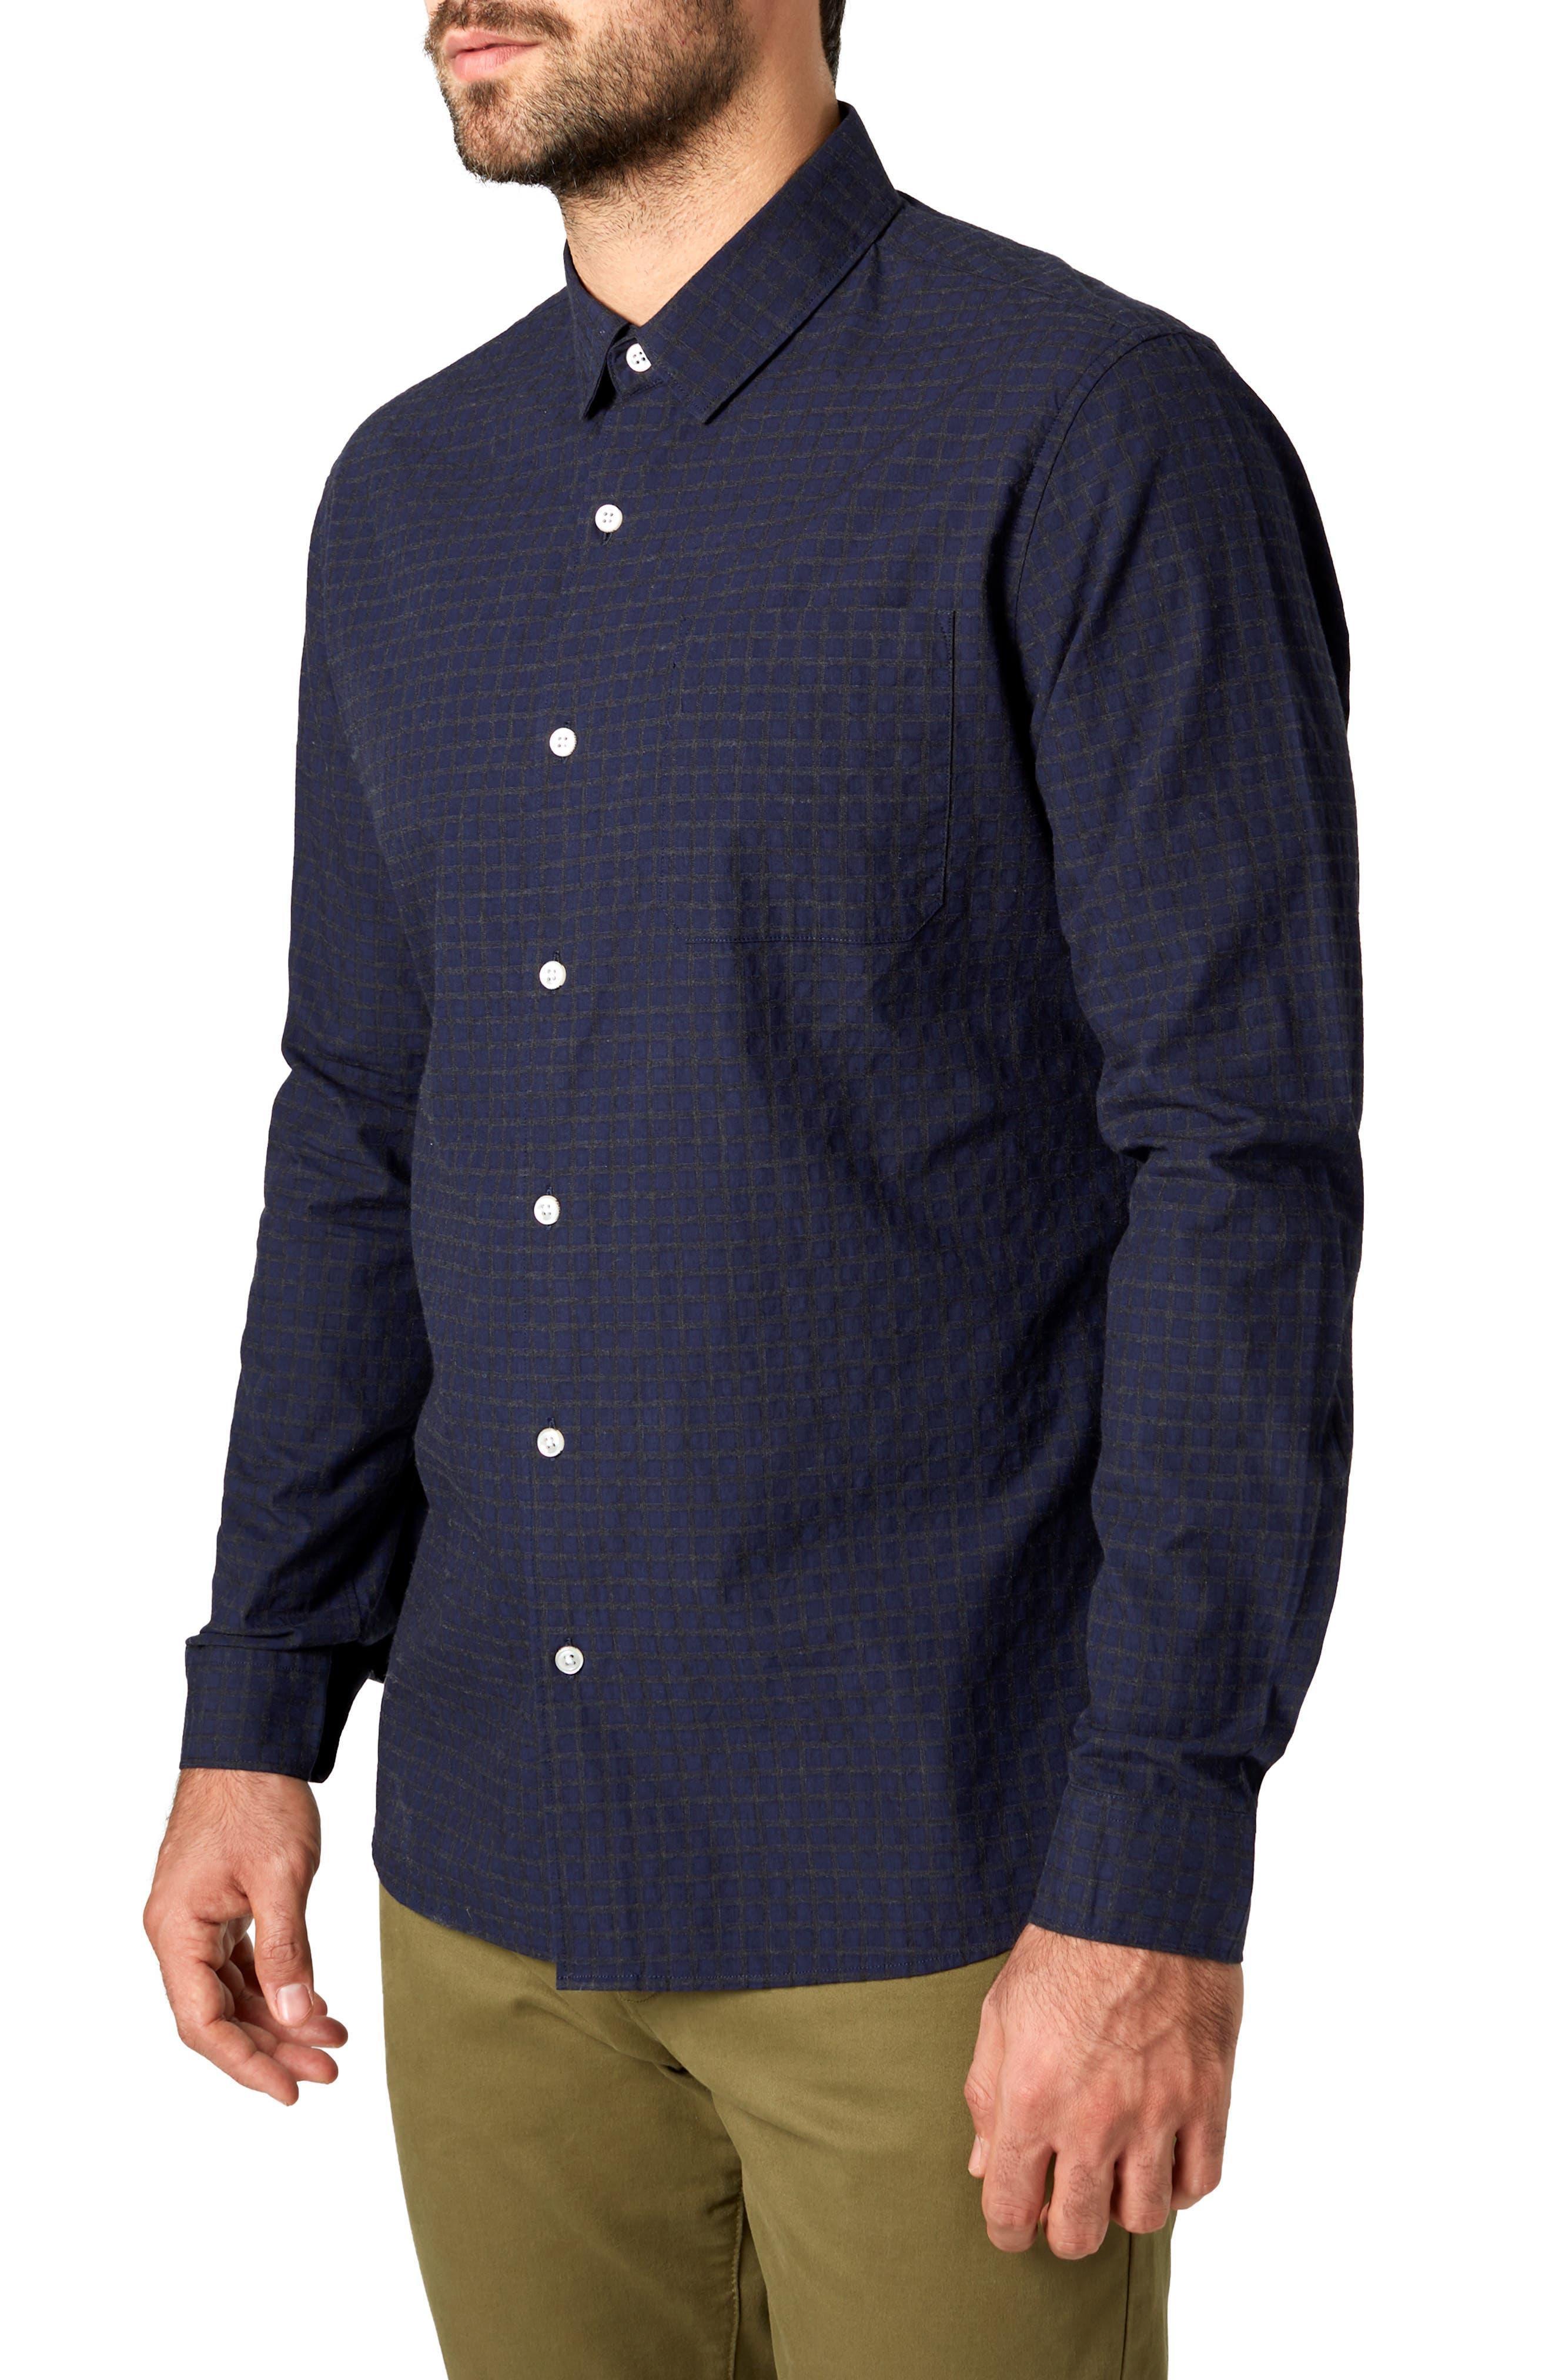 Players Club Trim Fit Linen Blend Sport Shirt,                             Alternate thumbnail 4, color,                             MIDNIGHT